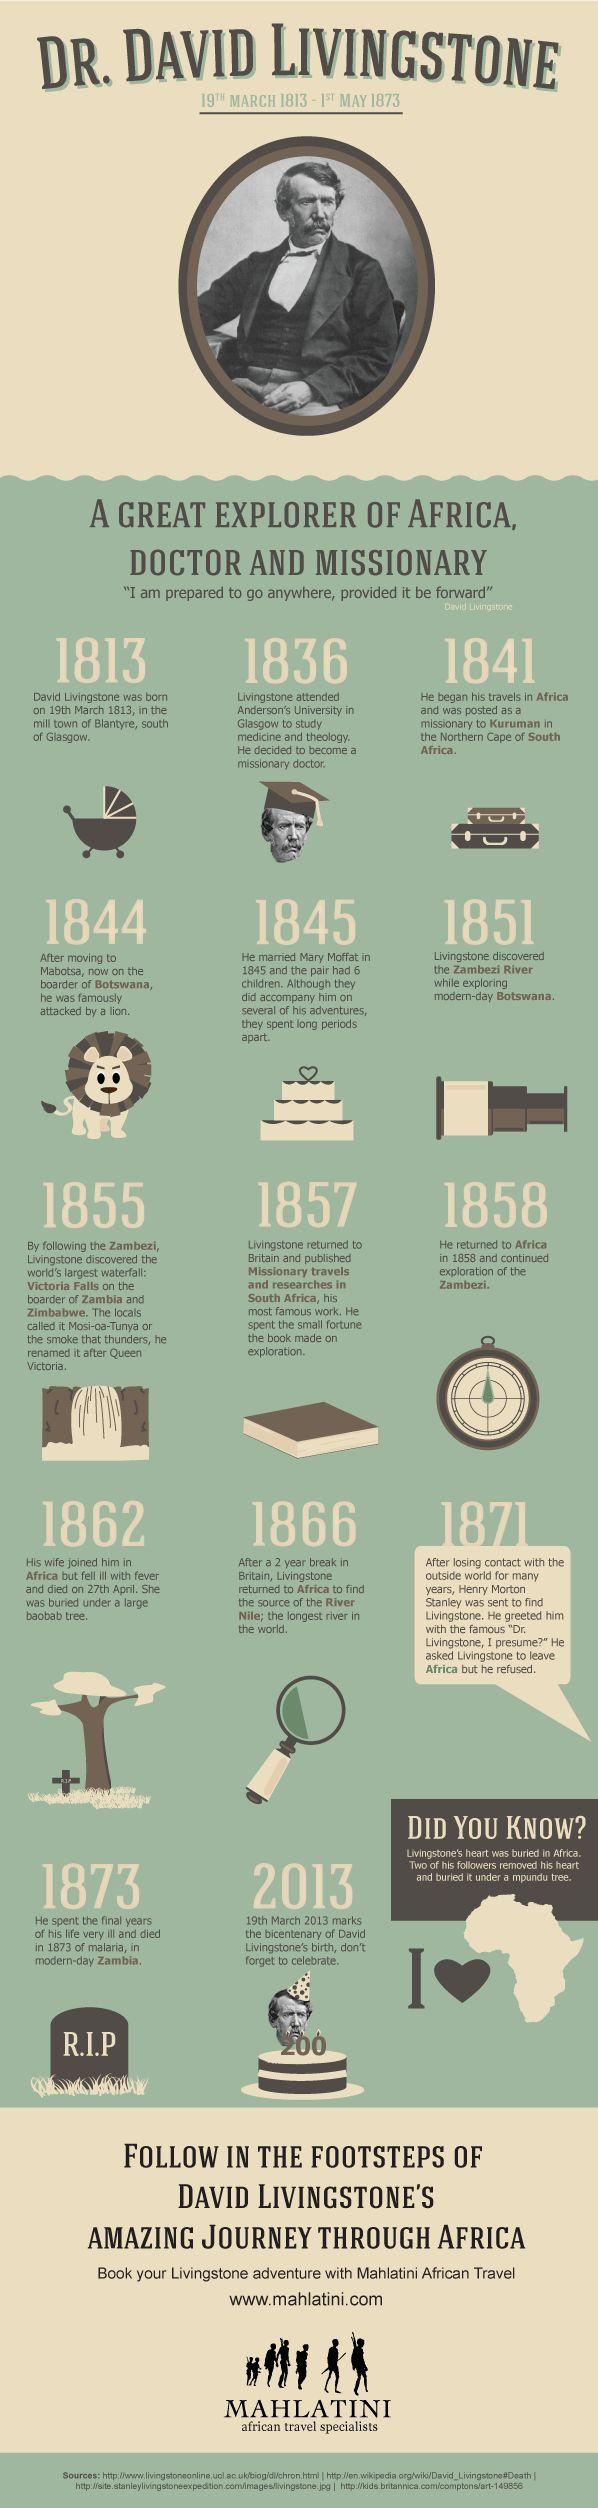 David Livingstone's Bicentenary Celebration